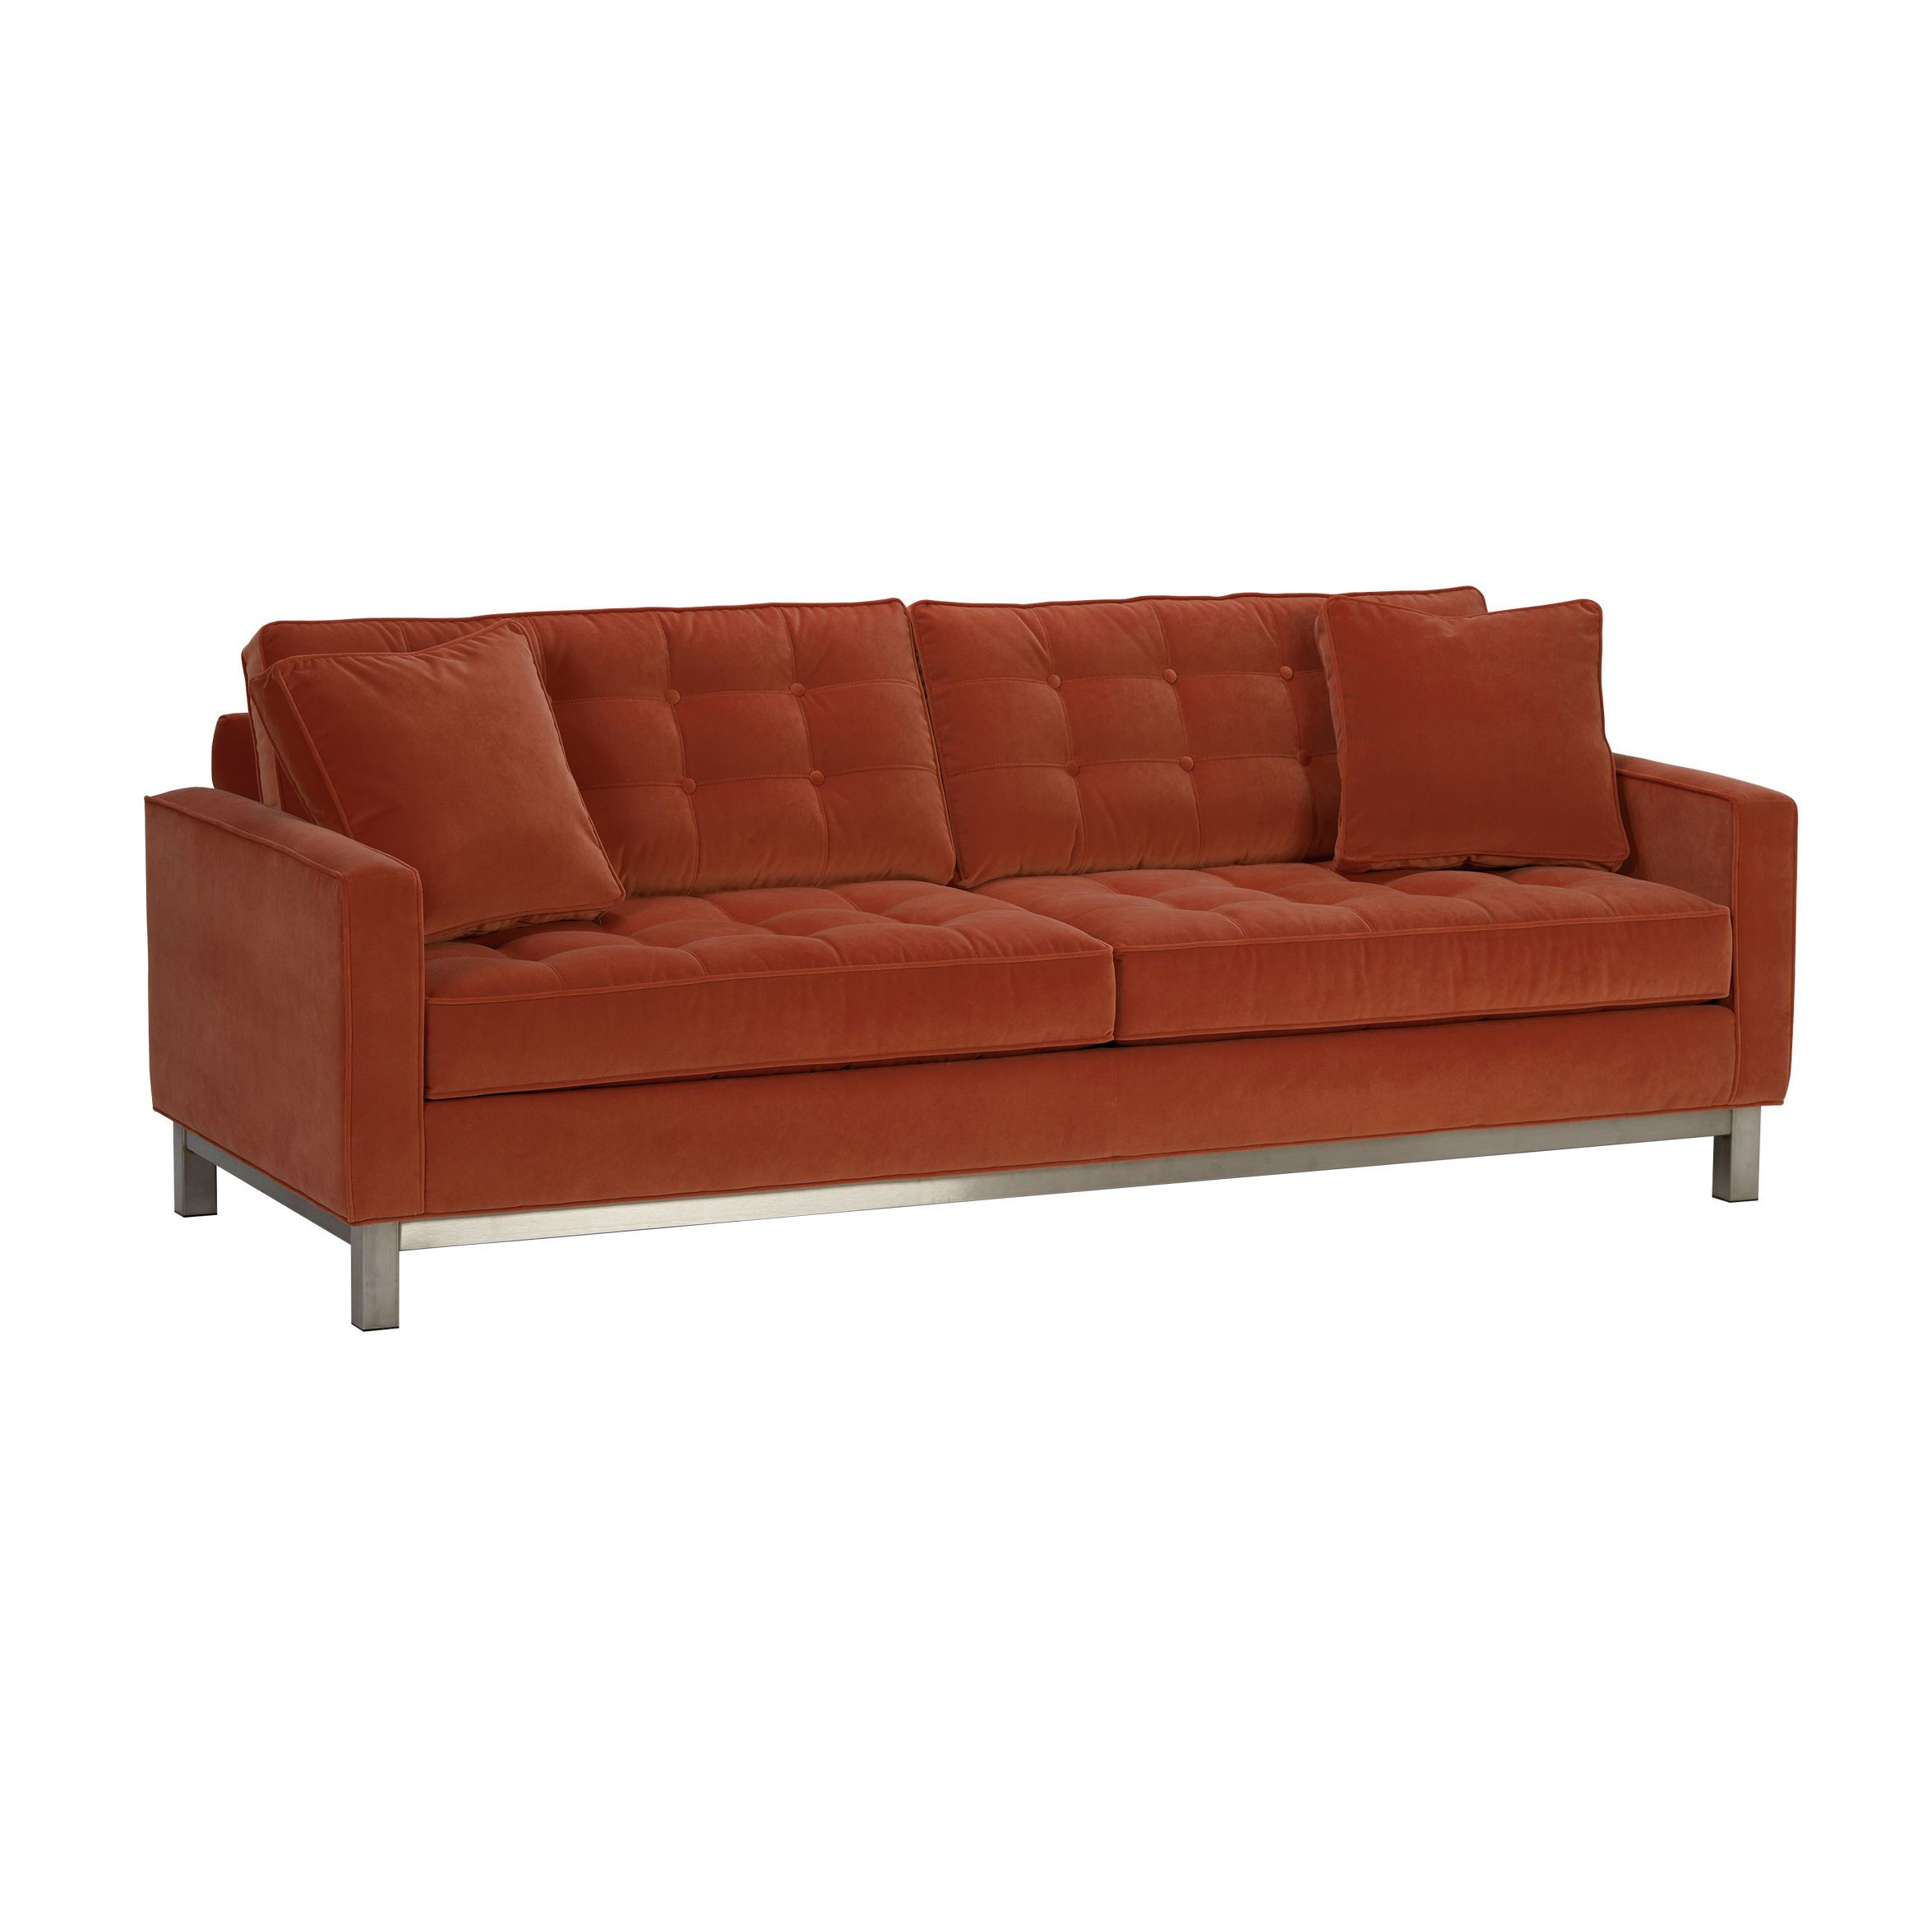 Ethan Allen s newest sofa the Melrose Ethan Allen furniture